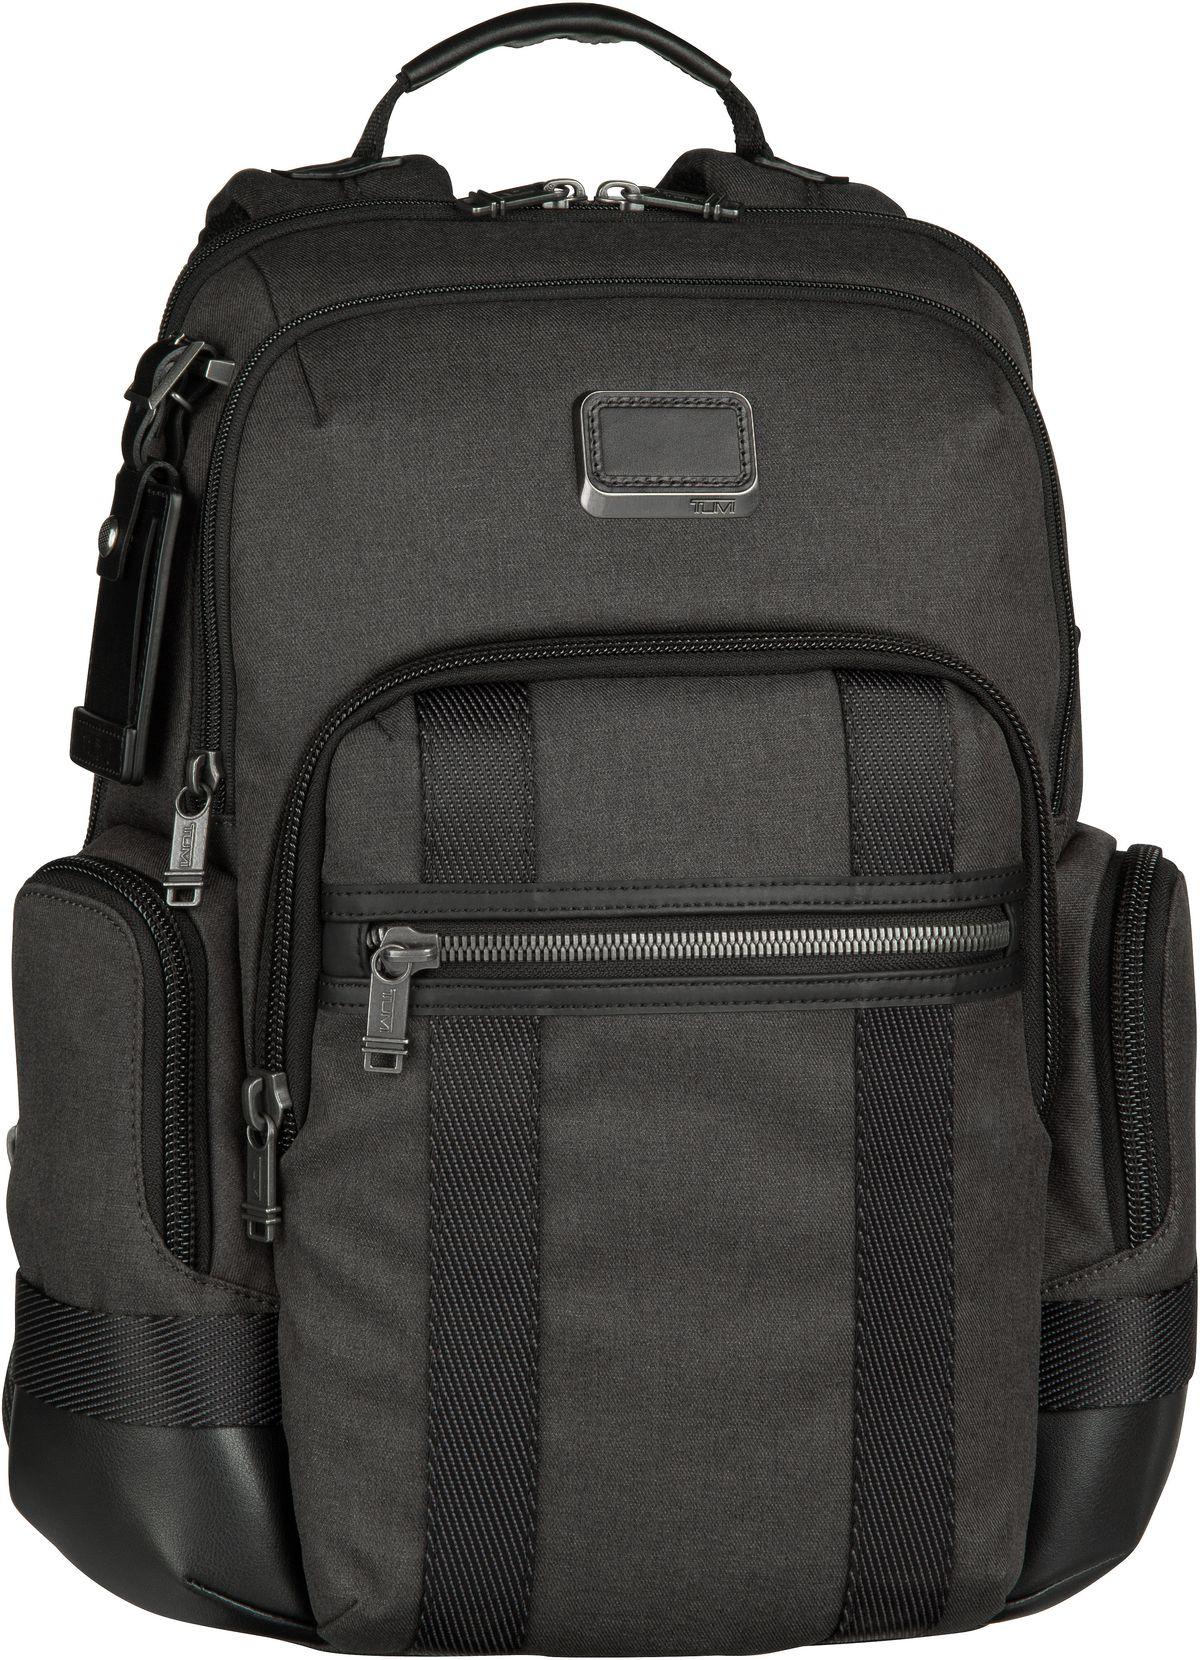 Rucksack / Daypack Alpha Bravo 232693 Nathan Backpack Graphite